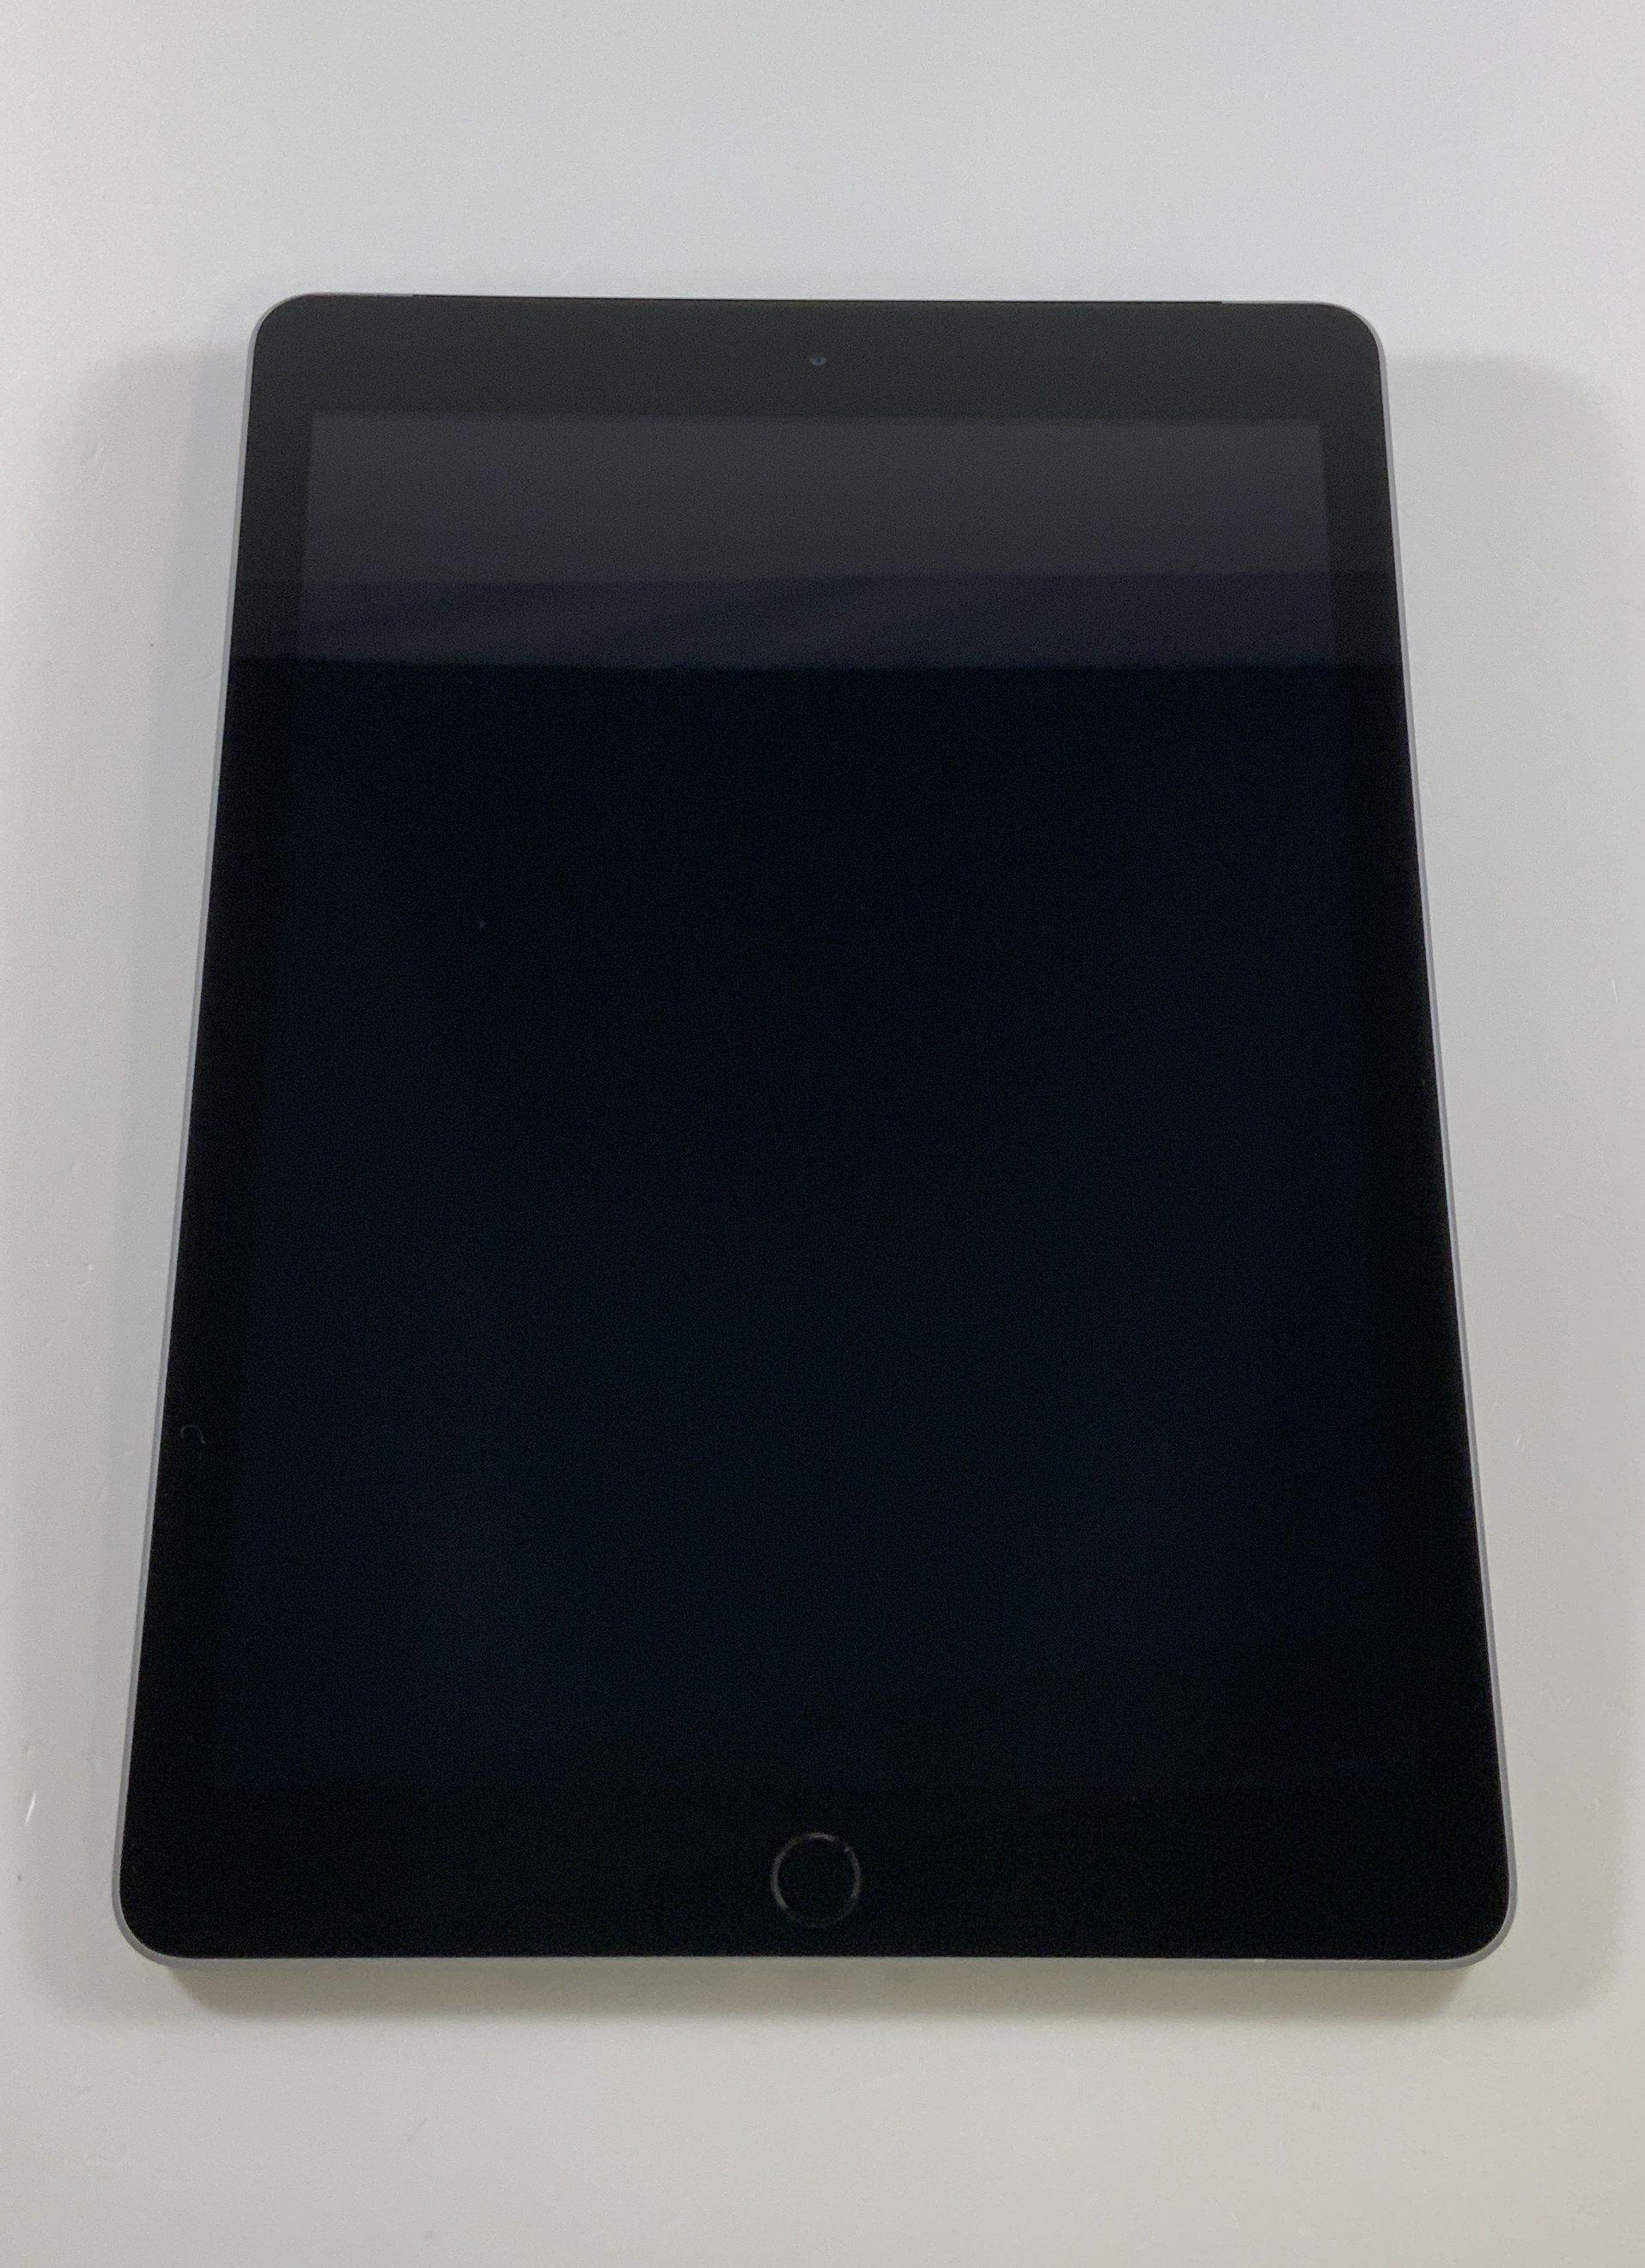 iPad 5 Wi-Fi + Cellular 128GB, 128GB, Space Gray, obraz 1